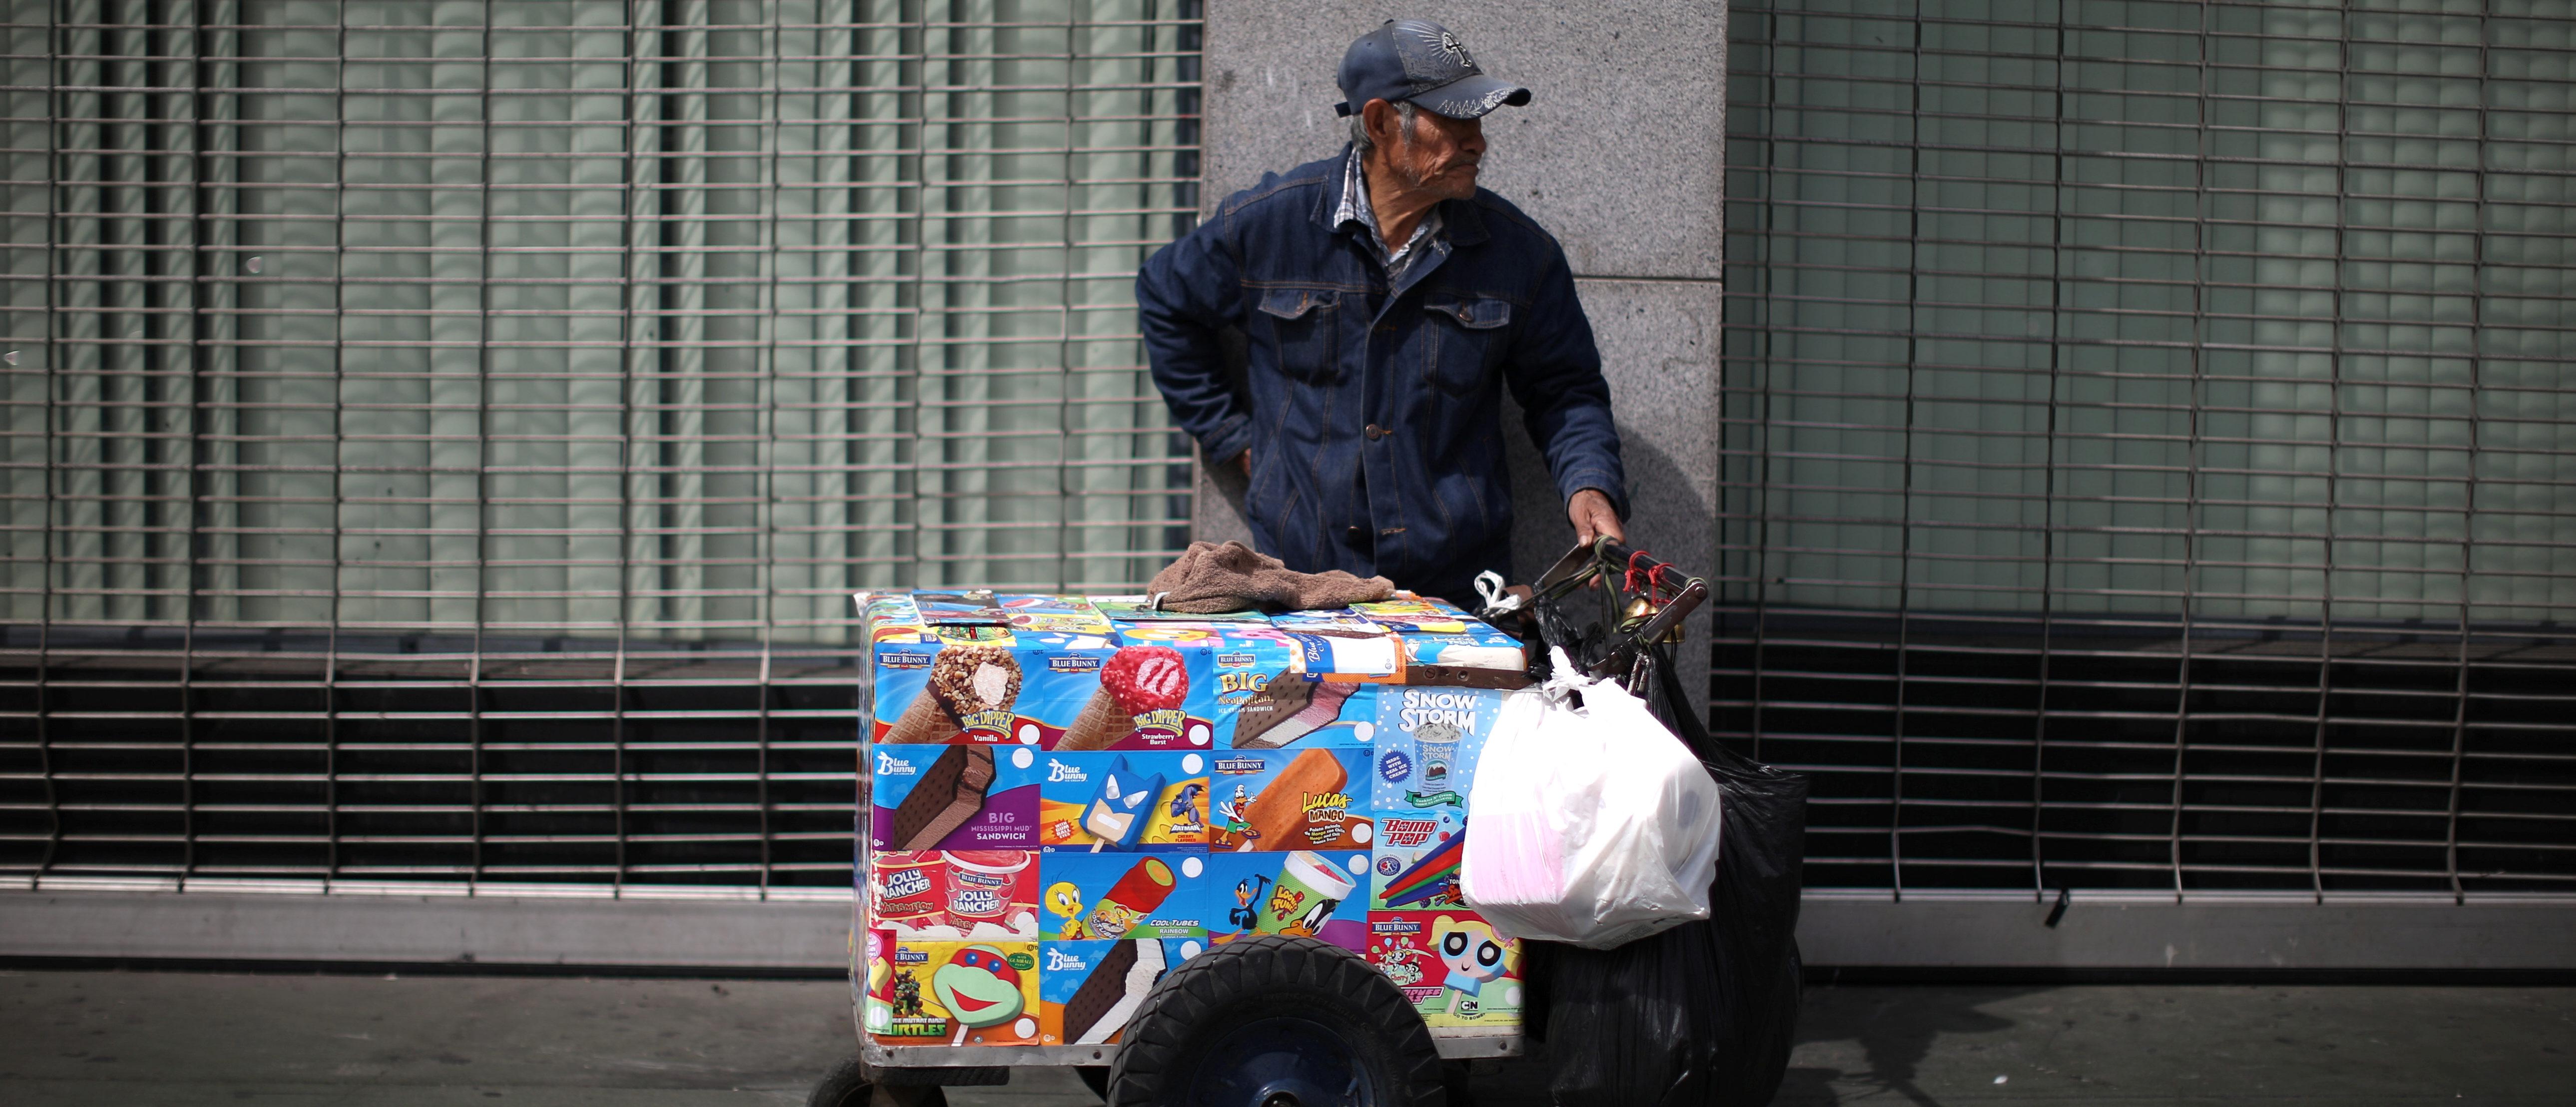 A street vendor sells ice cream in Los Angeles, California, U.S., March 10, 2017. REUTERS/Lucy Nicholson